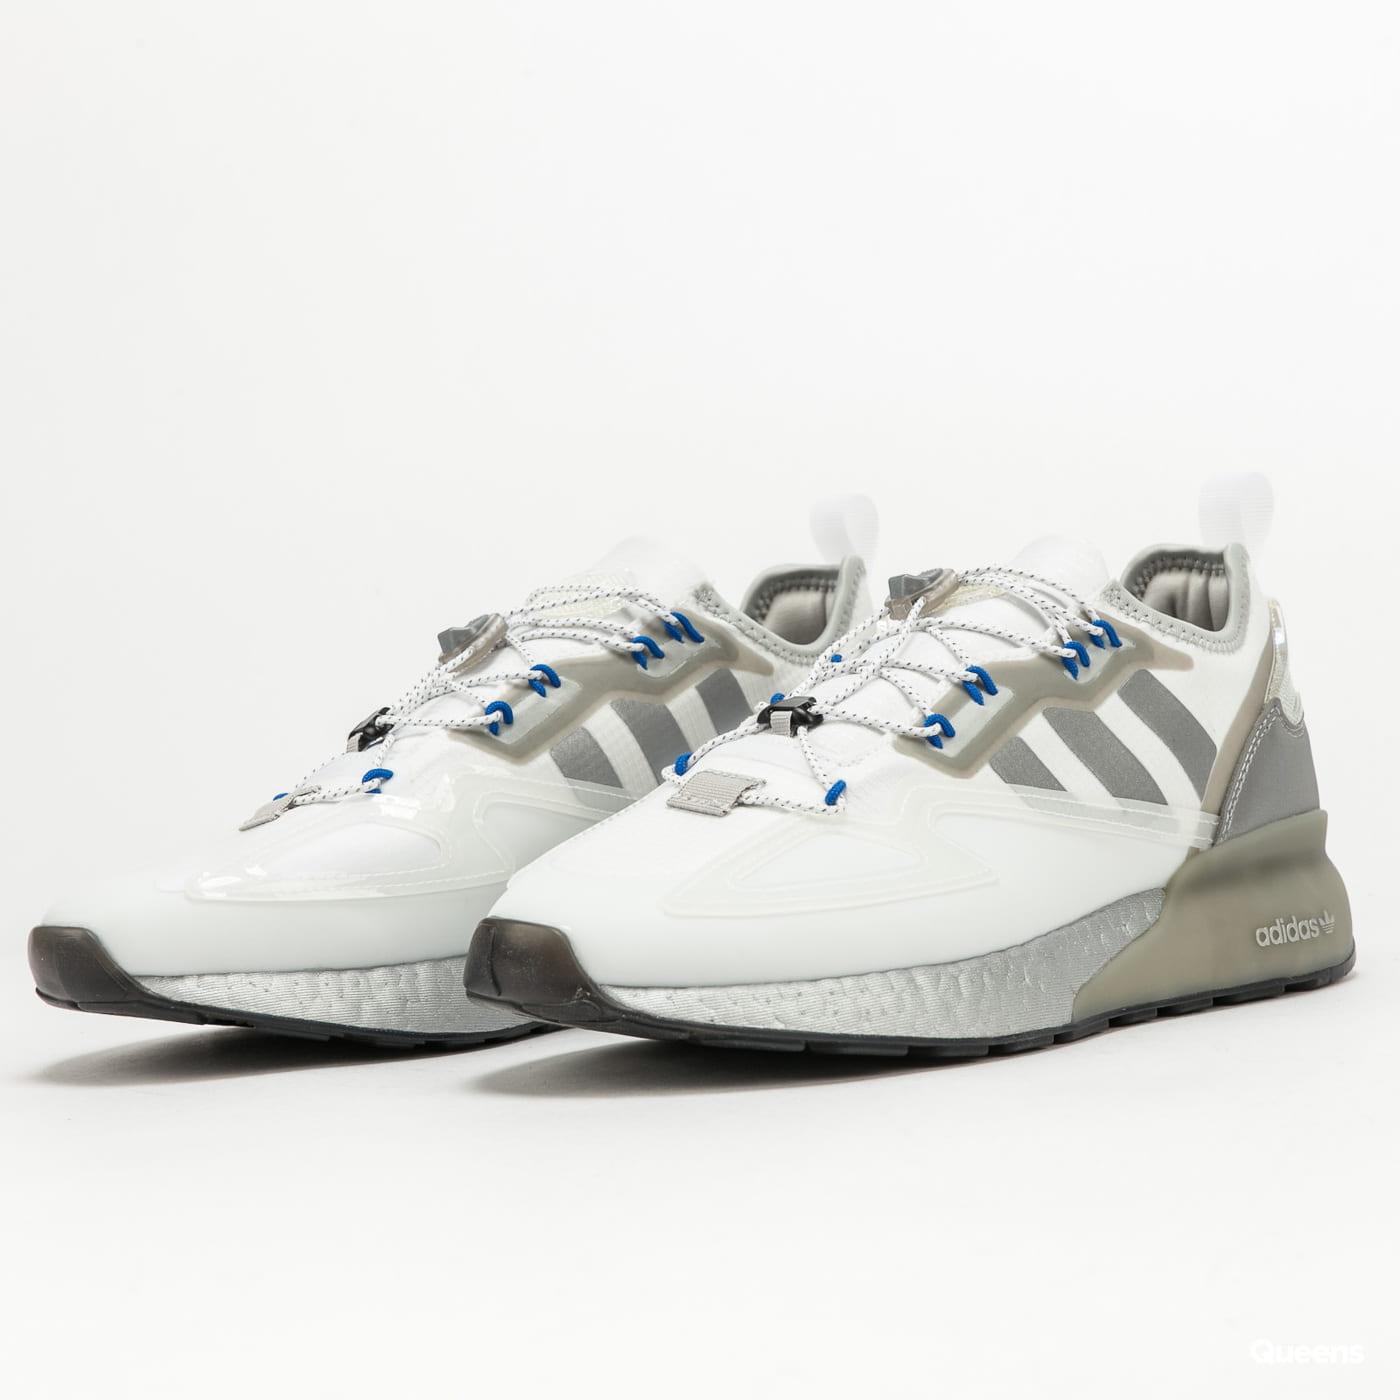 adidas Originals ZX 2K Boost ftwwht / silvmt / cblack